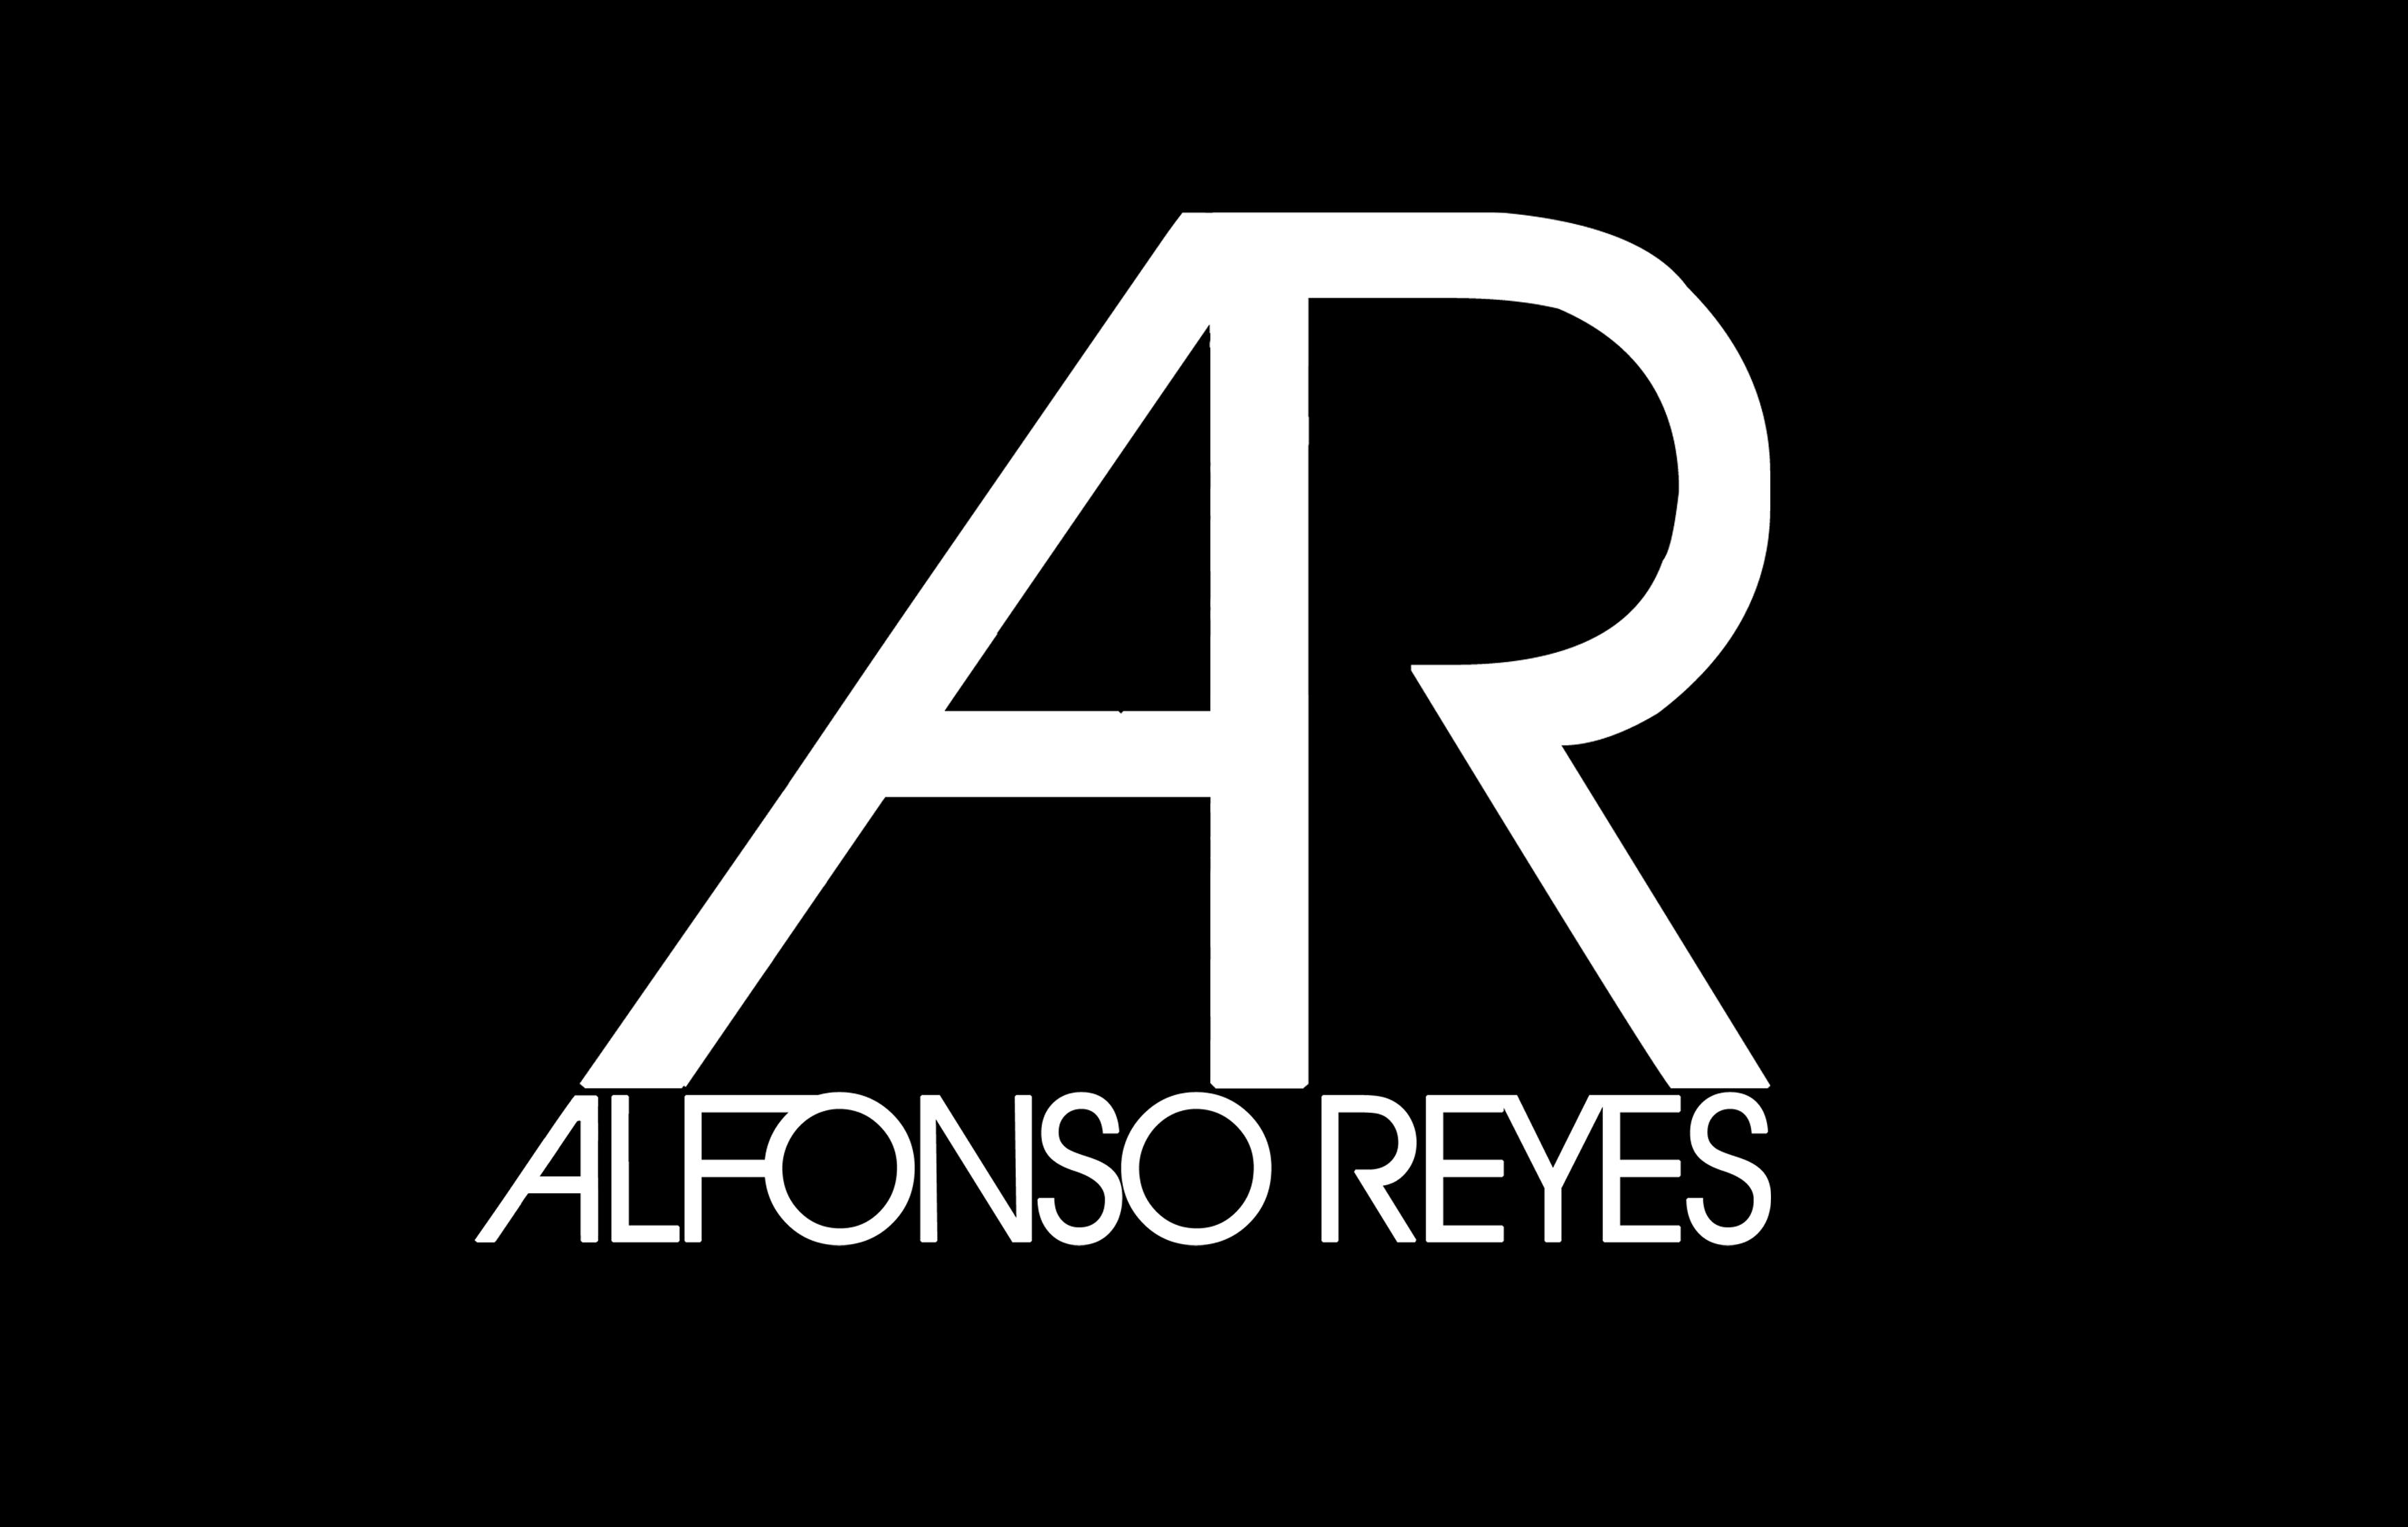 ALFONSO REYES DJ